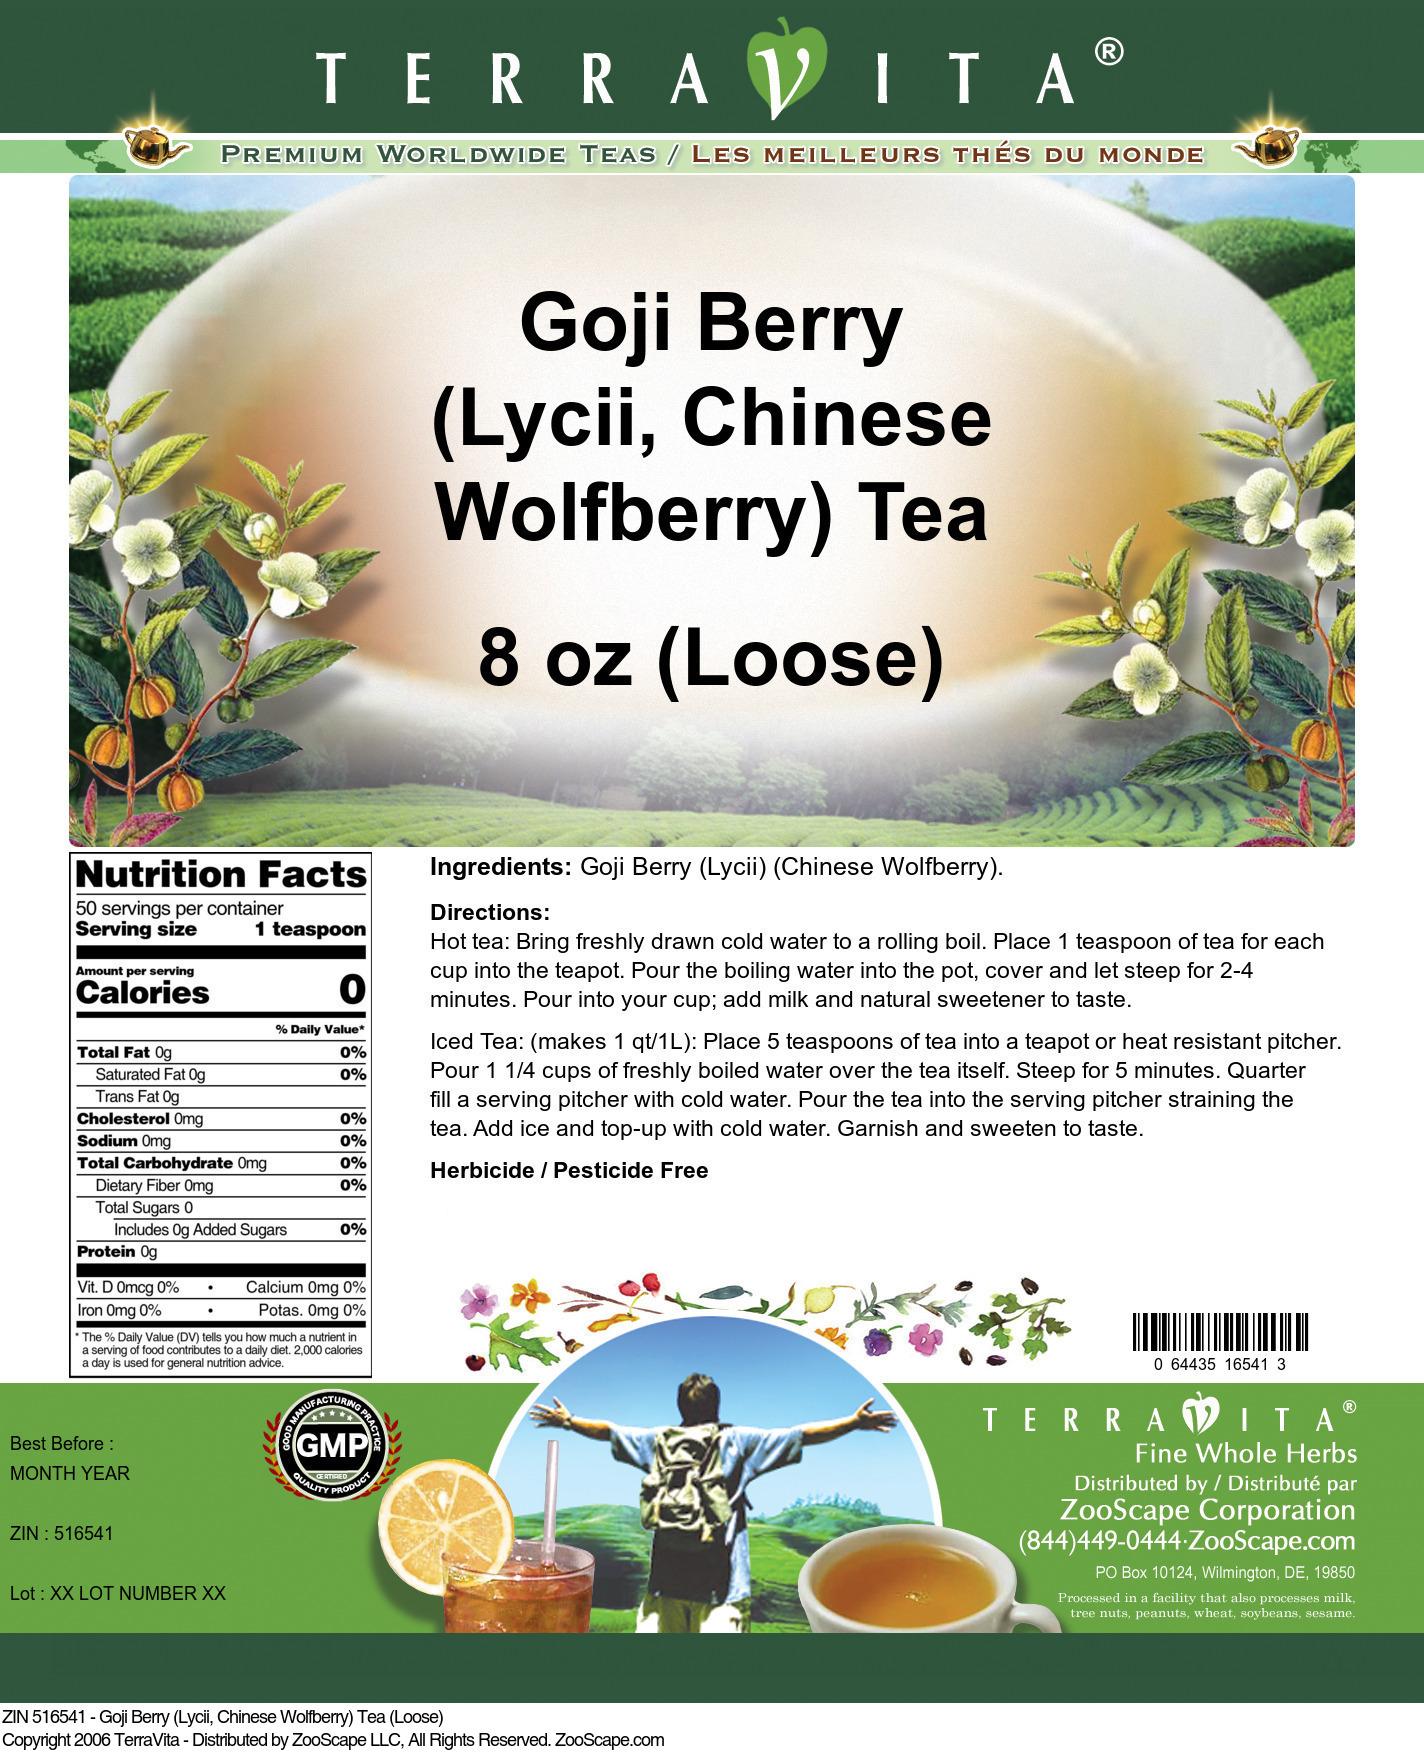 Goji Berry (Lycii, Chinese Wolfberry) Tea (Loose)